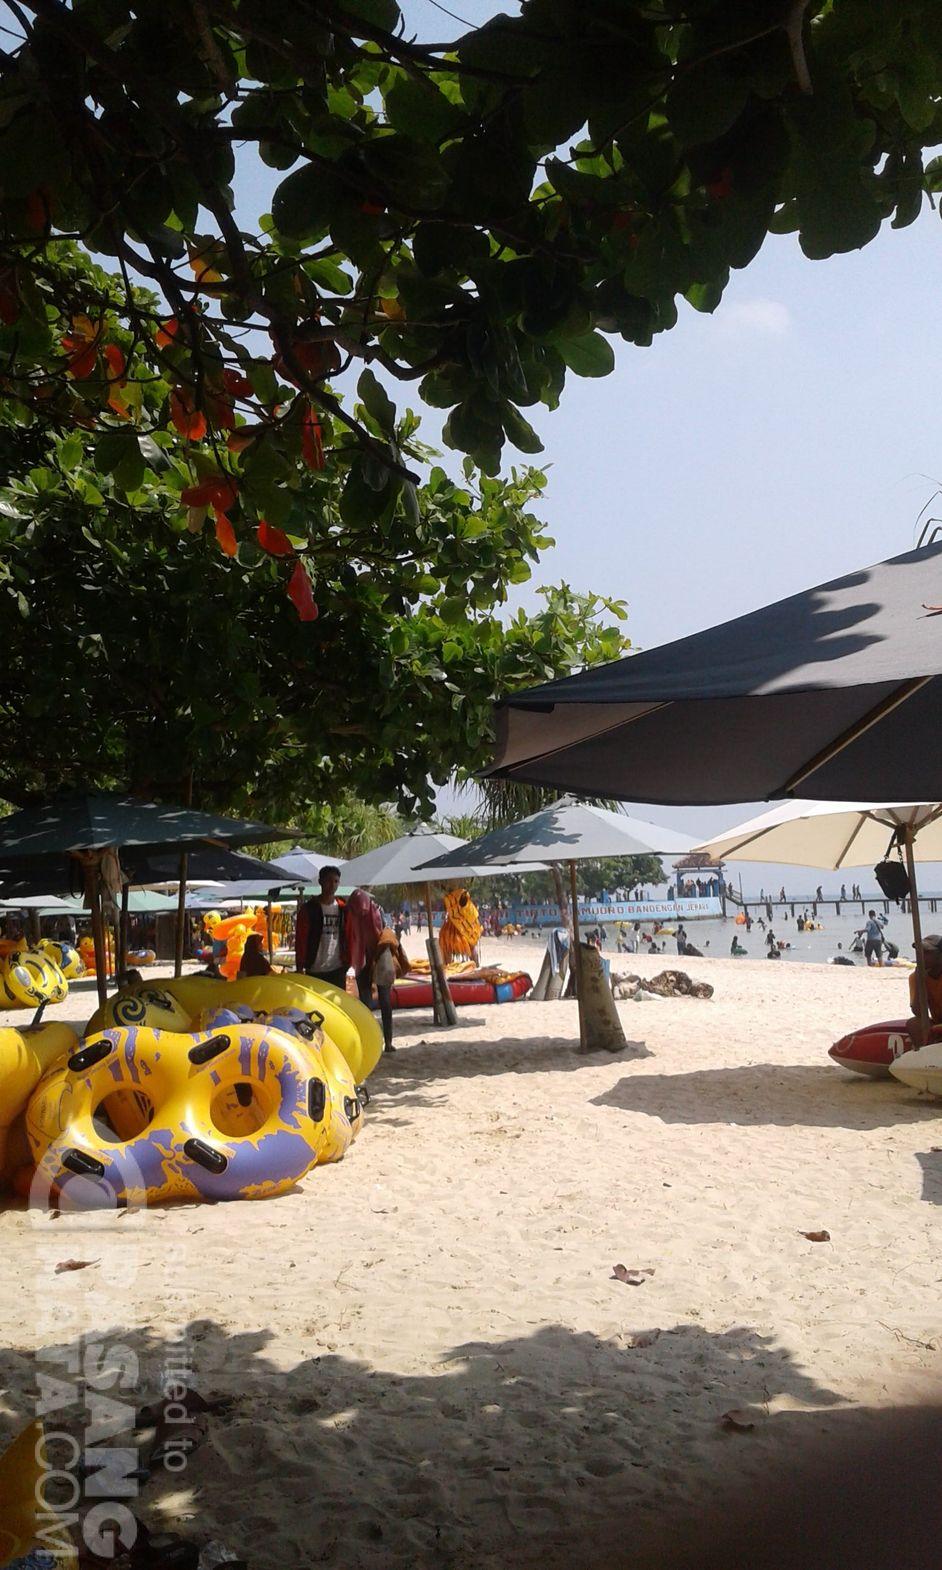 205m4d1 Pantai Tirta Samudra Jepara